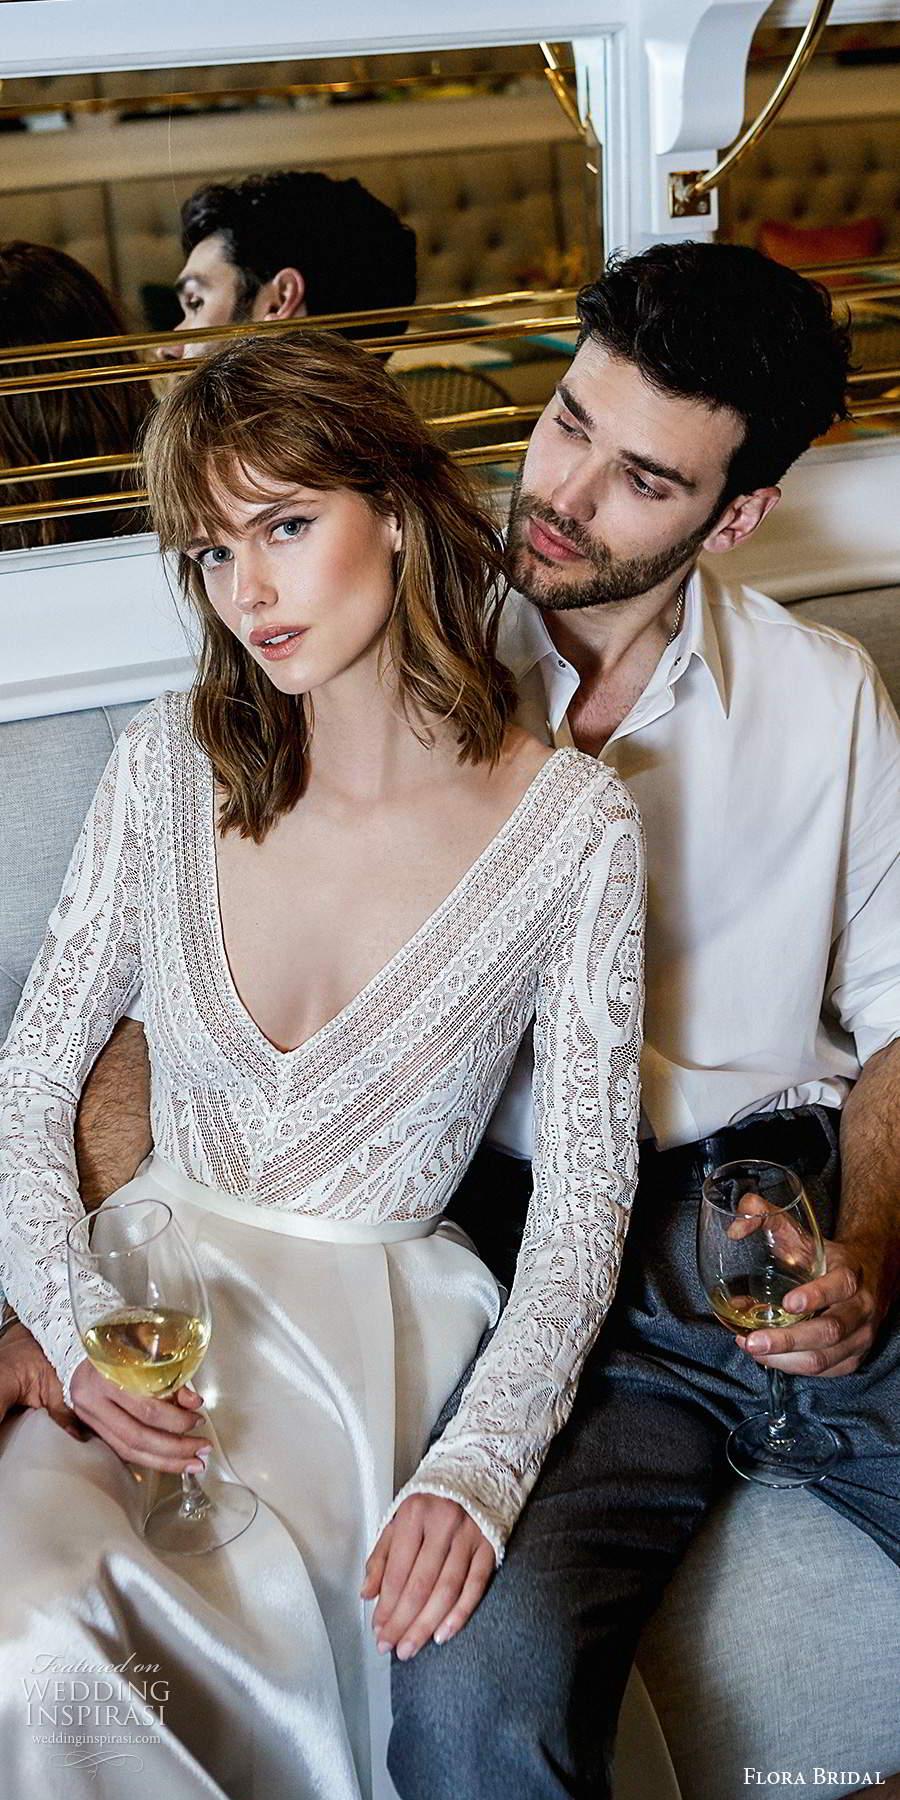 flora bridal 2020 bridal long sleeves deep v neckline embellished lace bodice clean skirt elegant ball gown a line wedding dress chapel train (9) zv